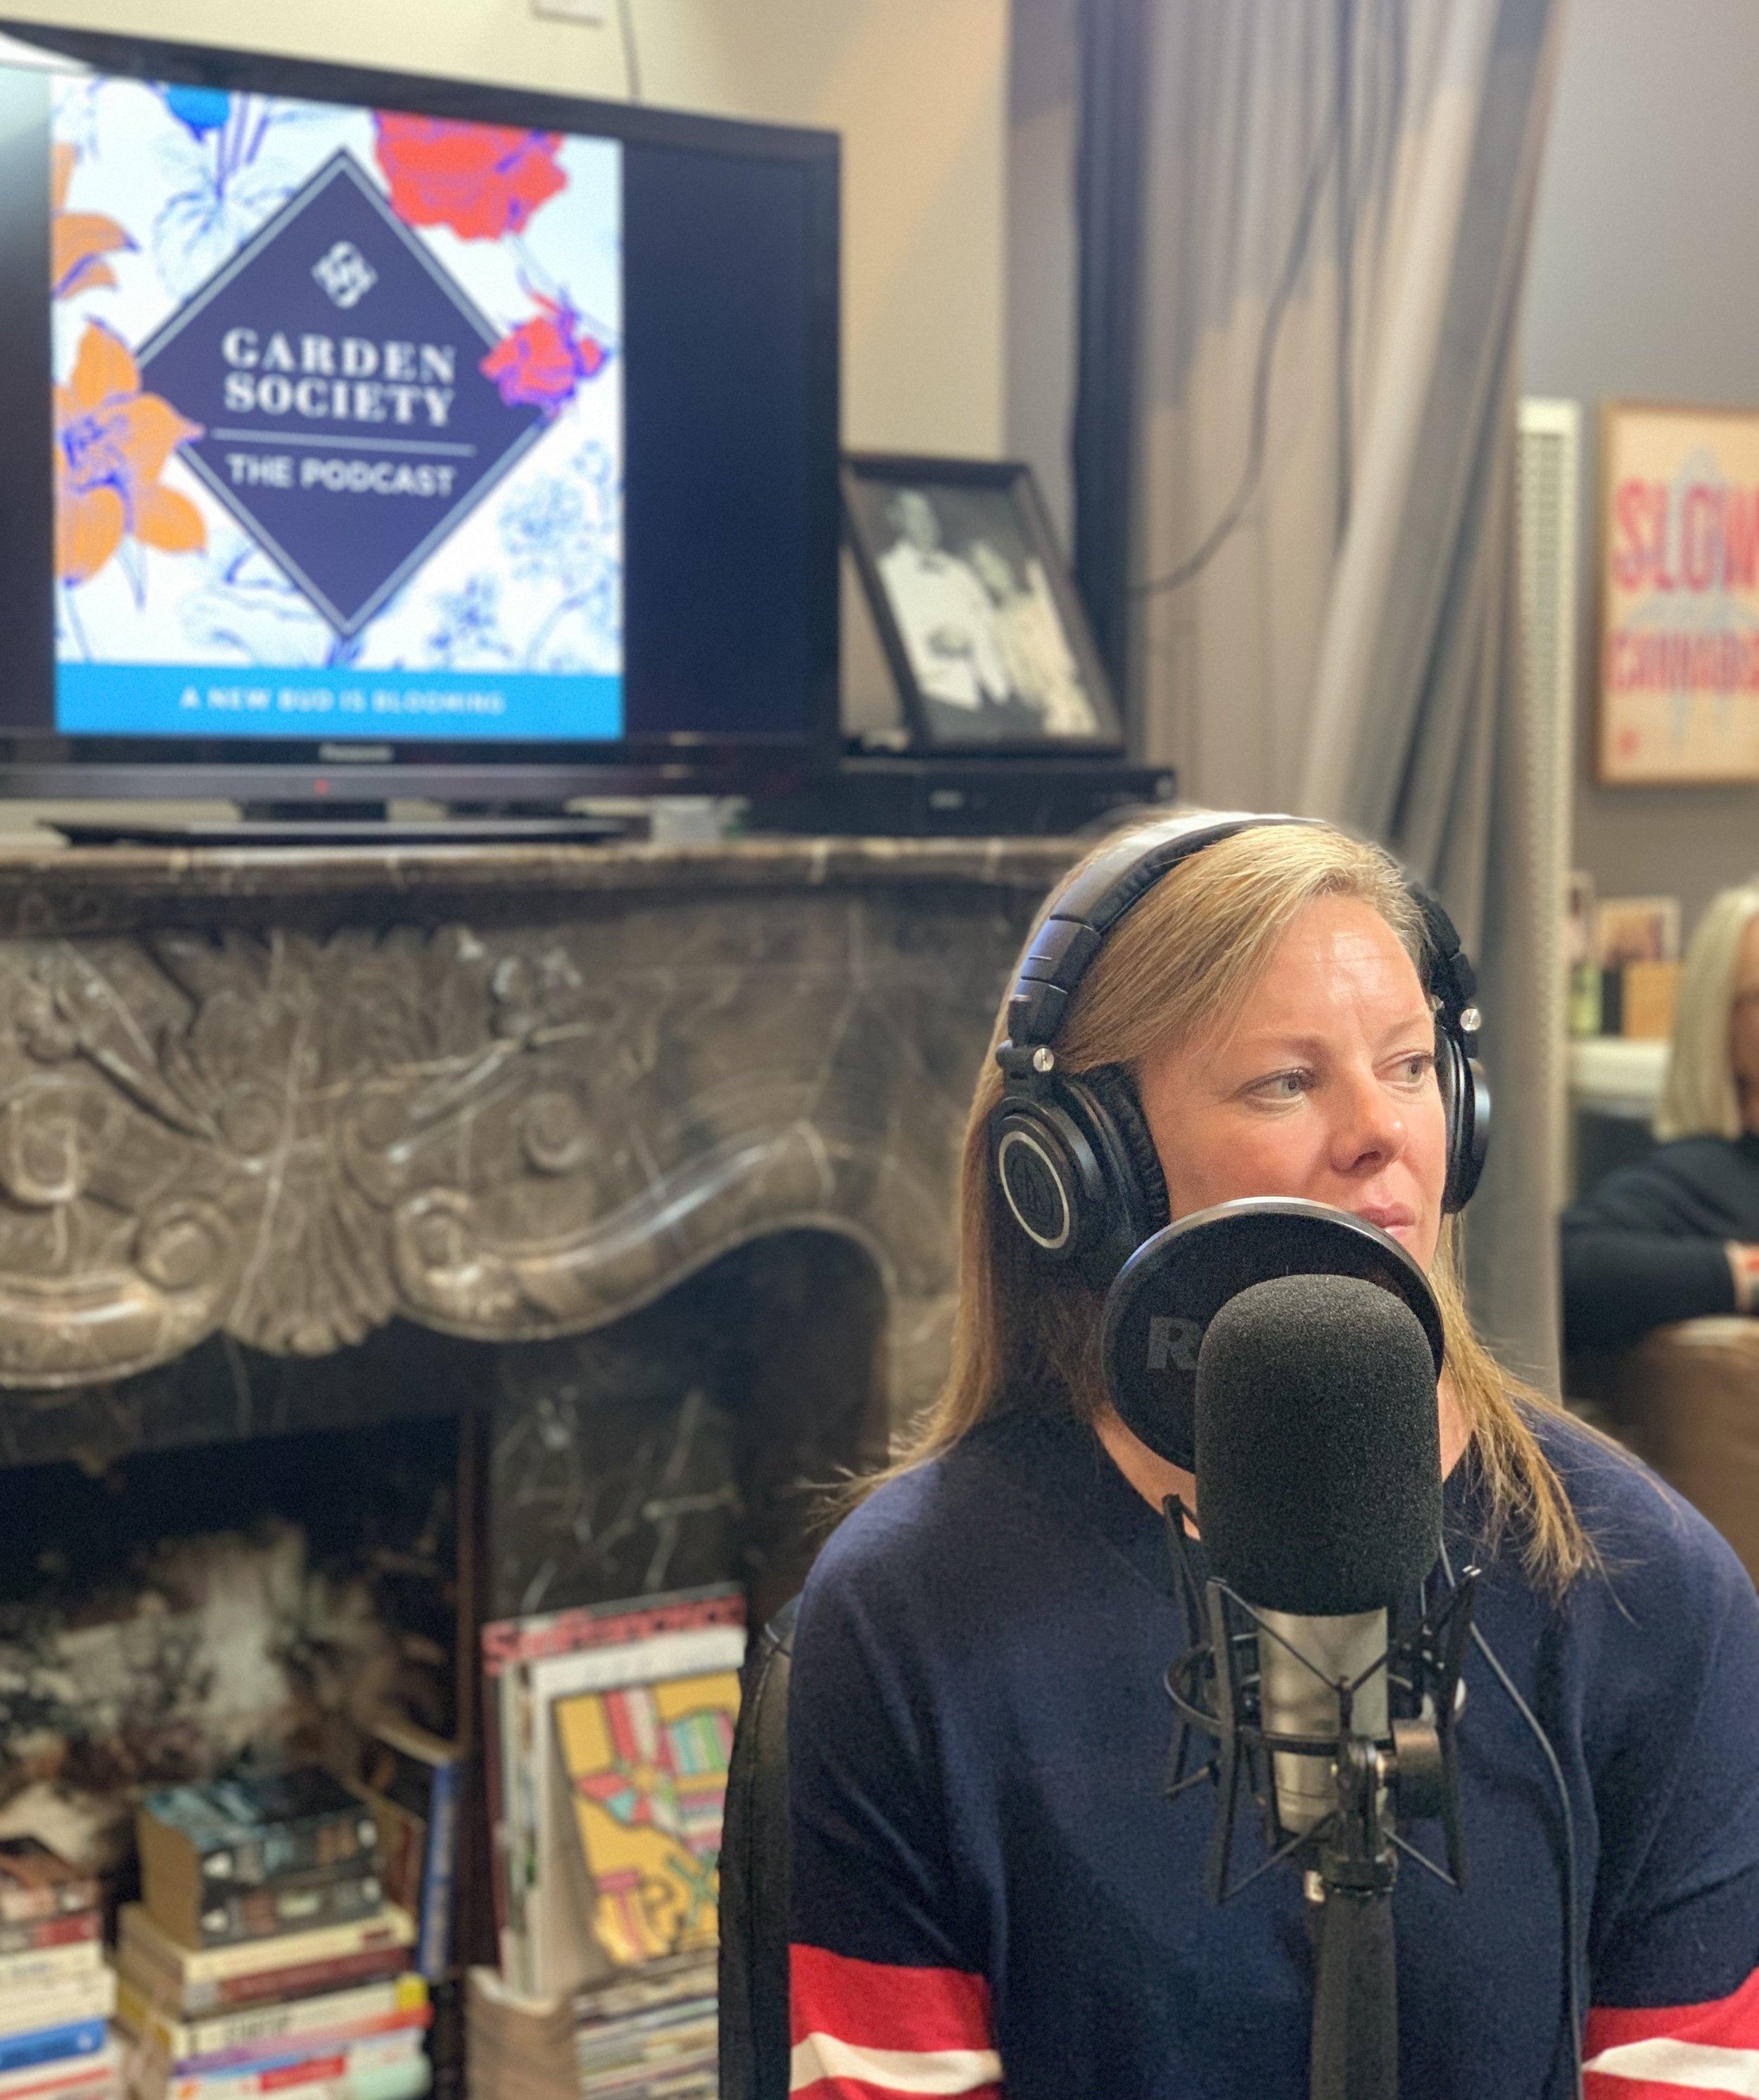 Samantha Ford Garden Society | The Podcast